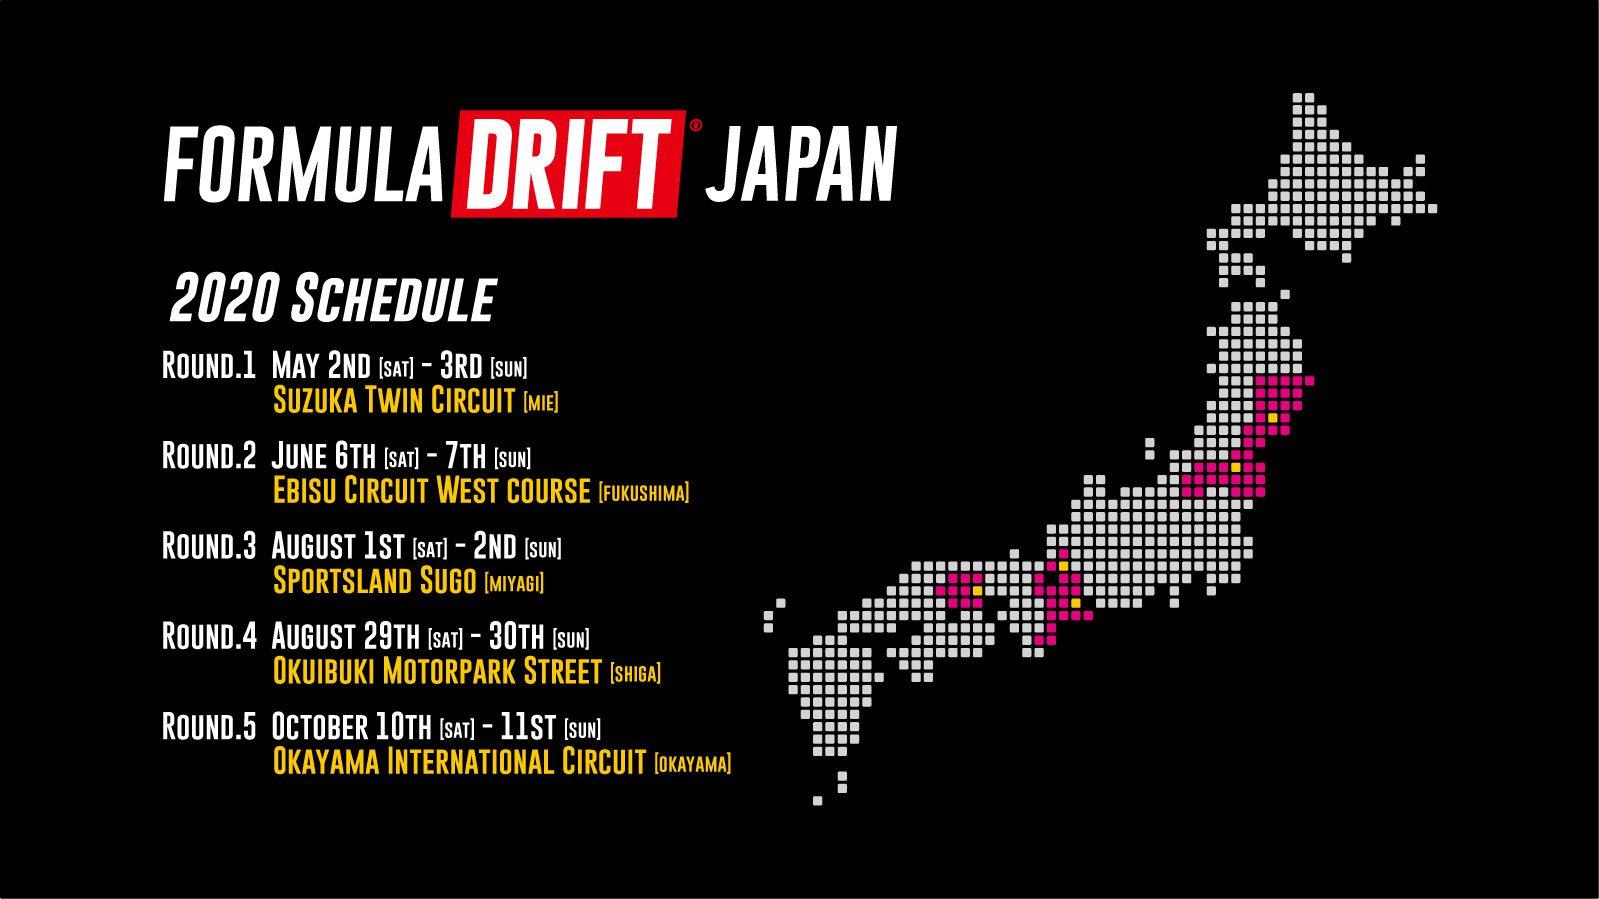 FDJP Suzuka Twin Circuit (MIE) @ Suzuka Twin Circuit (MIE)